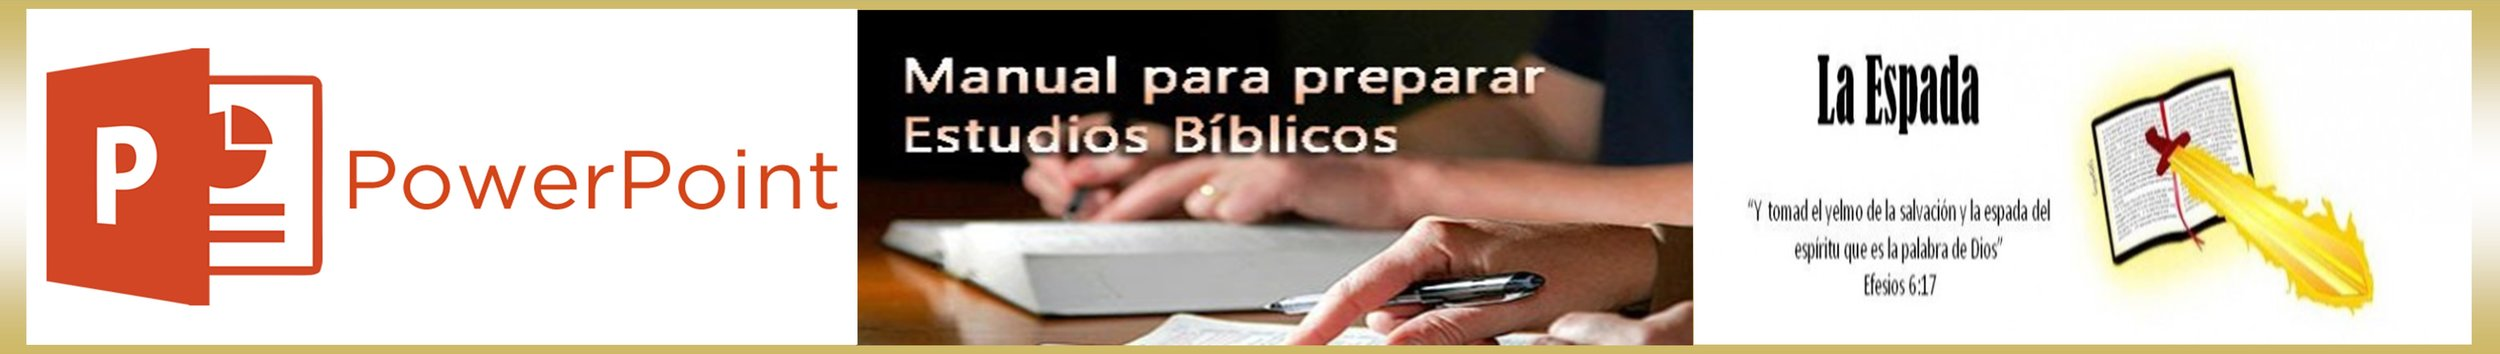 PowerPoint Estudios.jpg